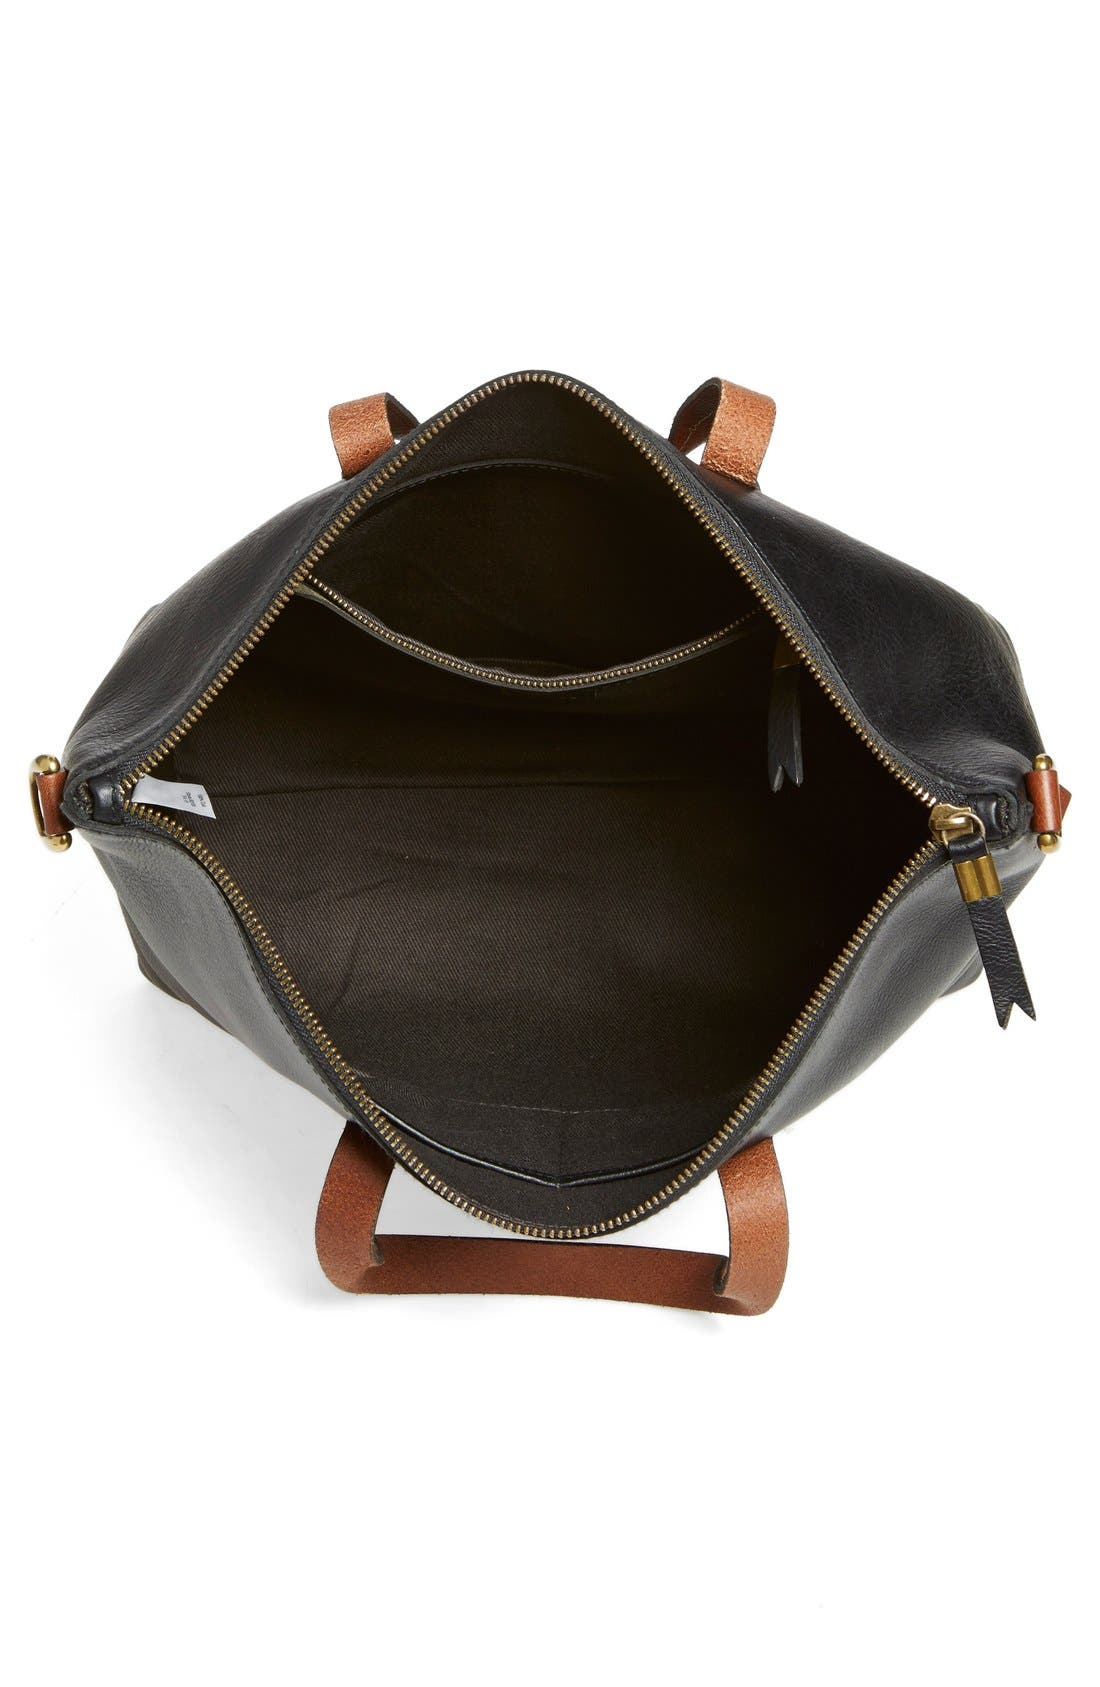 Leather Transport Satchel,                             Alternate thumbnail 2, color,                             001